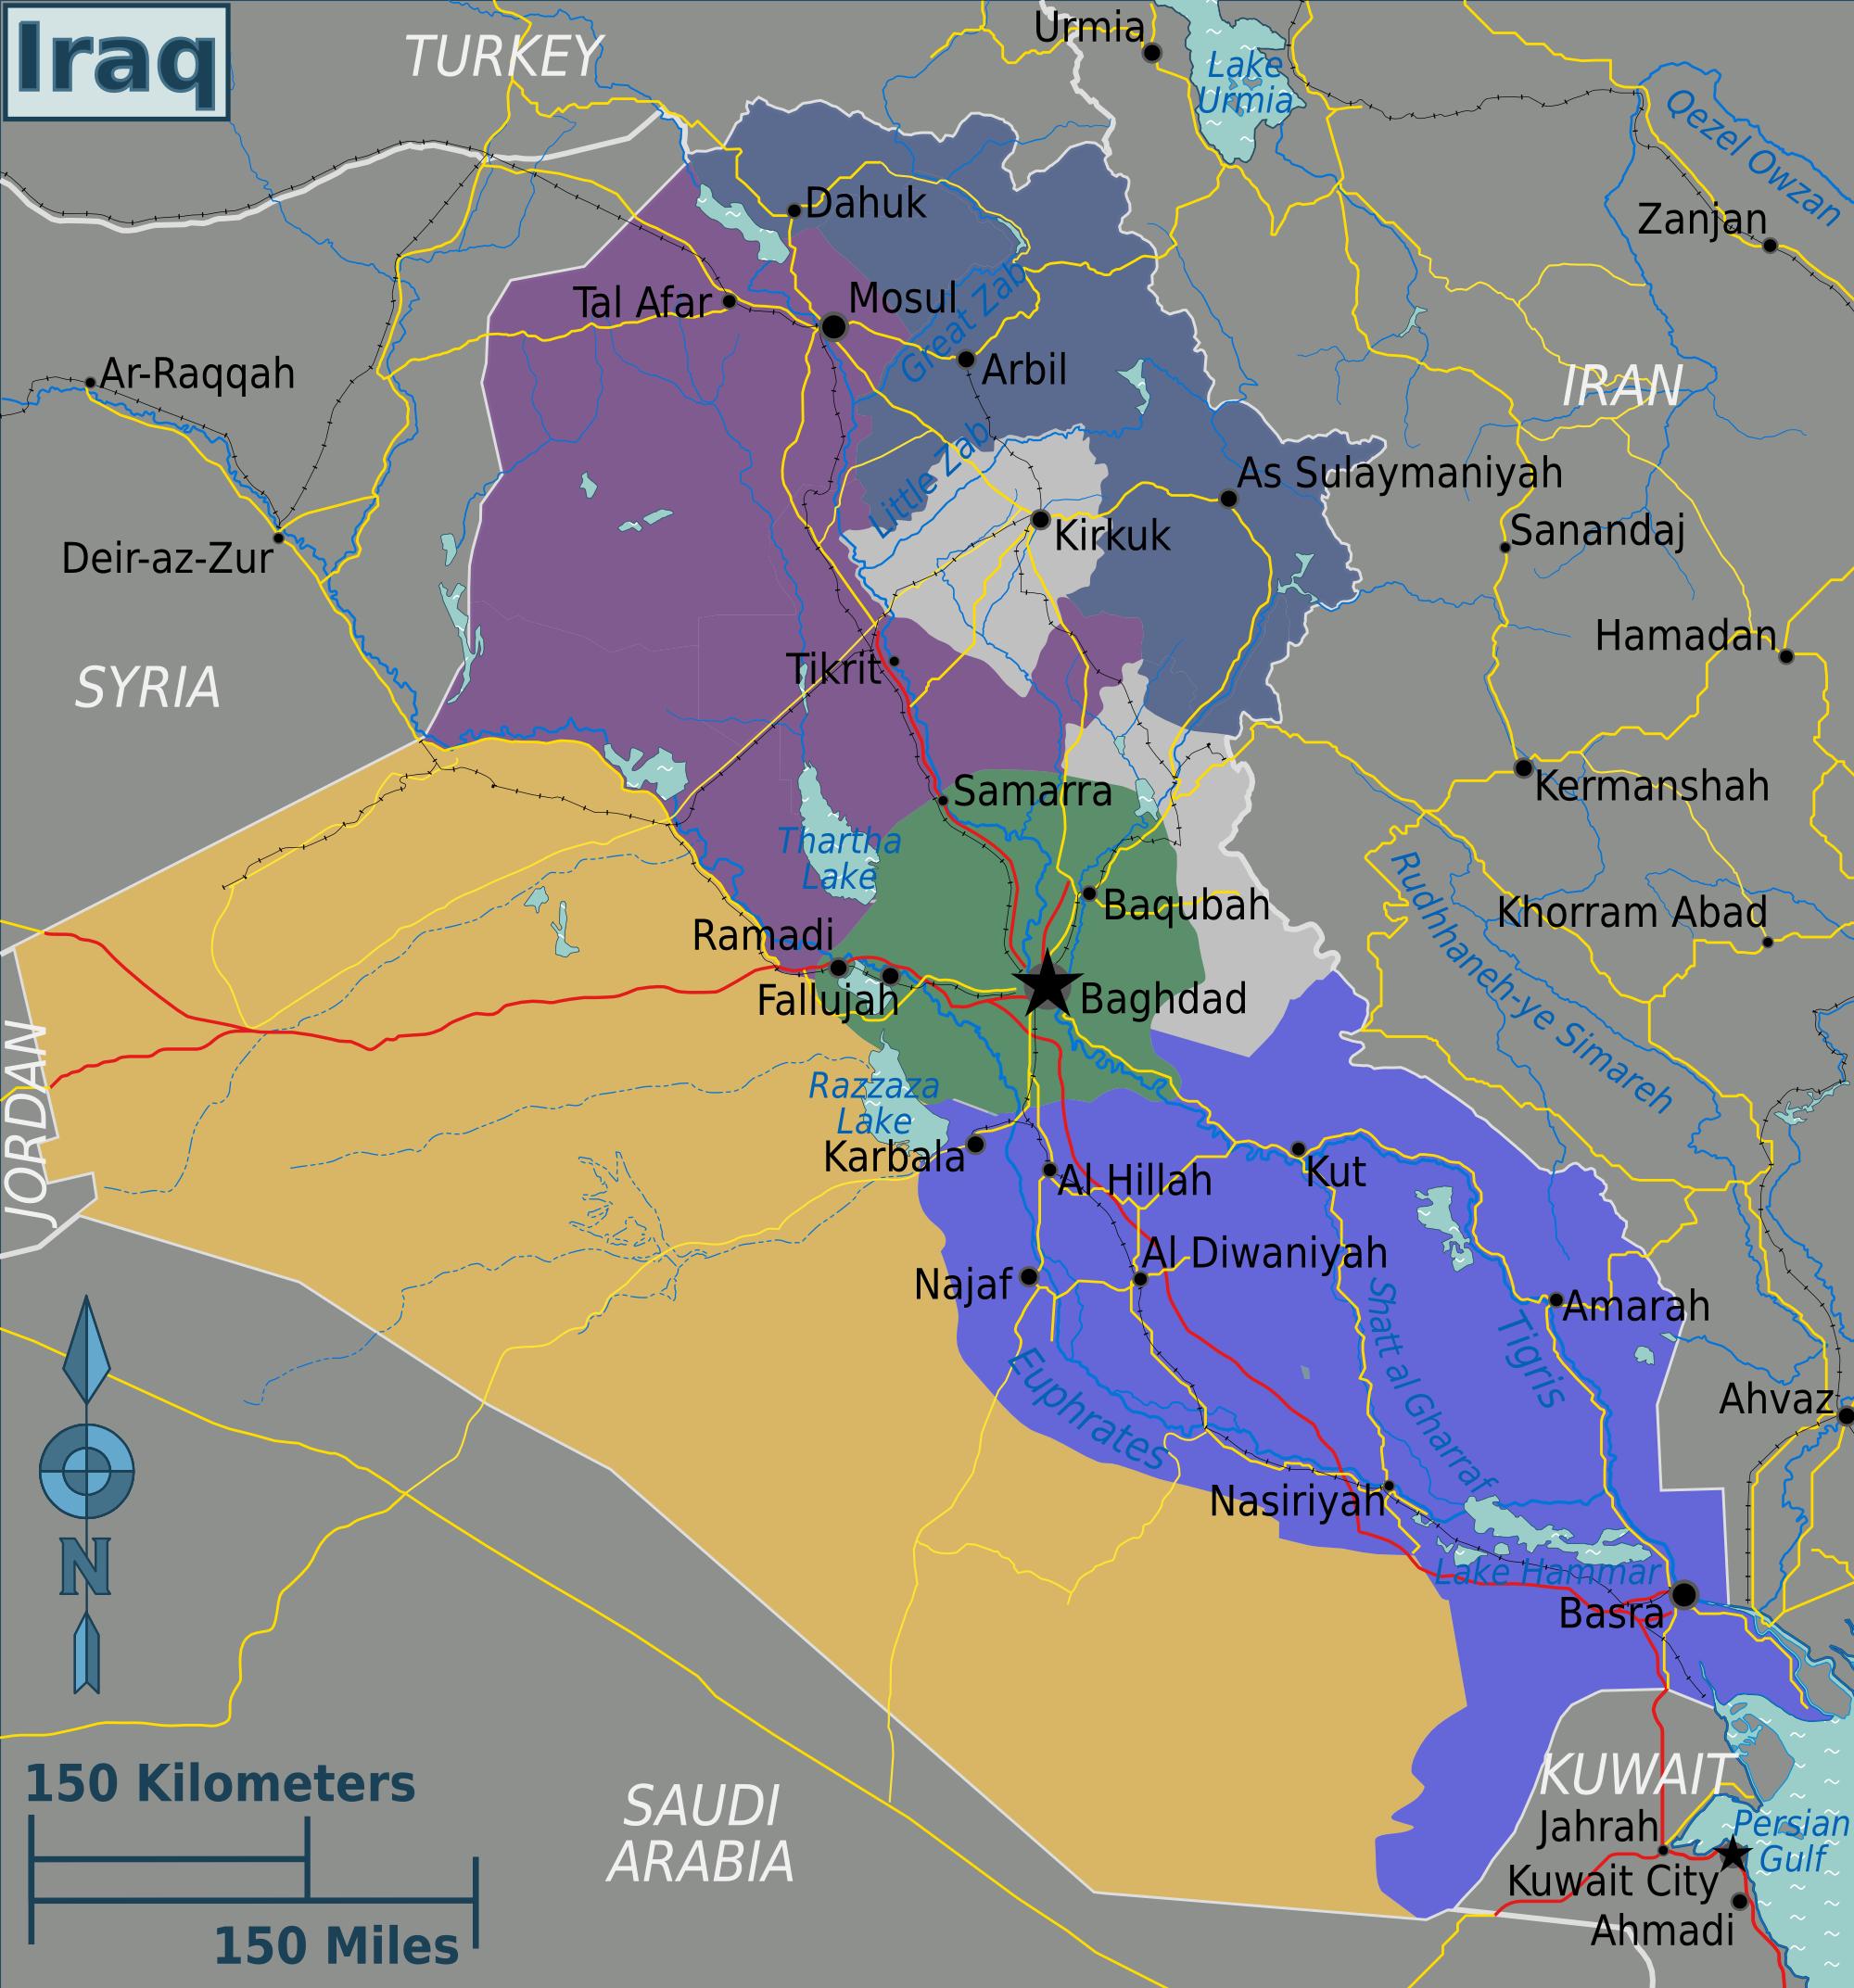 FileIraq regions map2png Wikimedia Commons